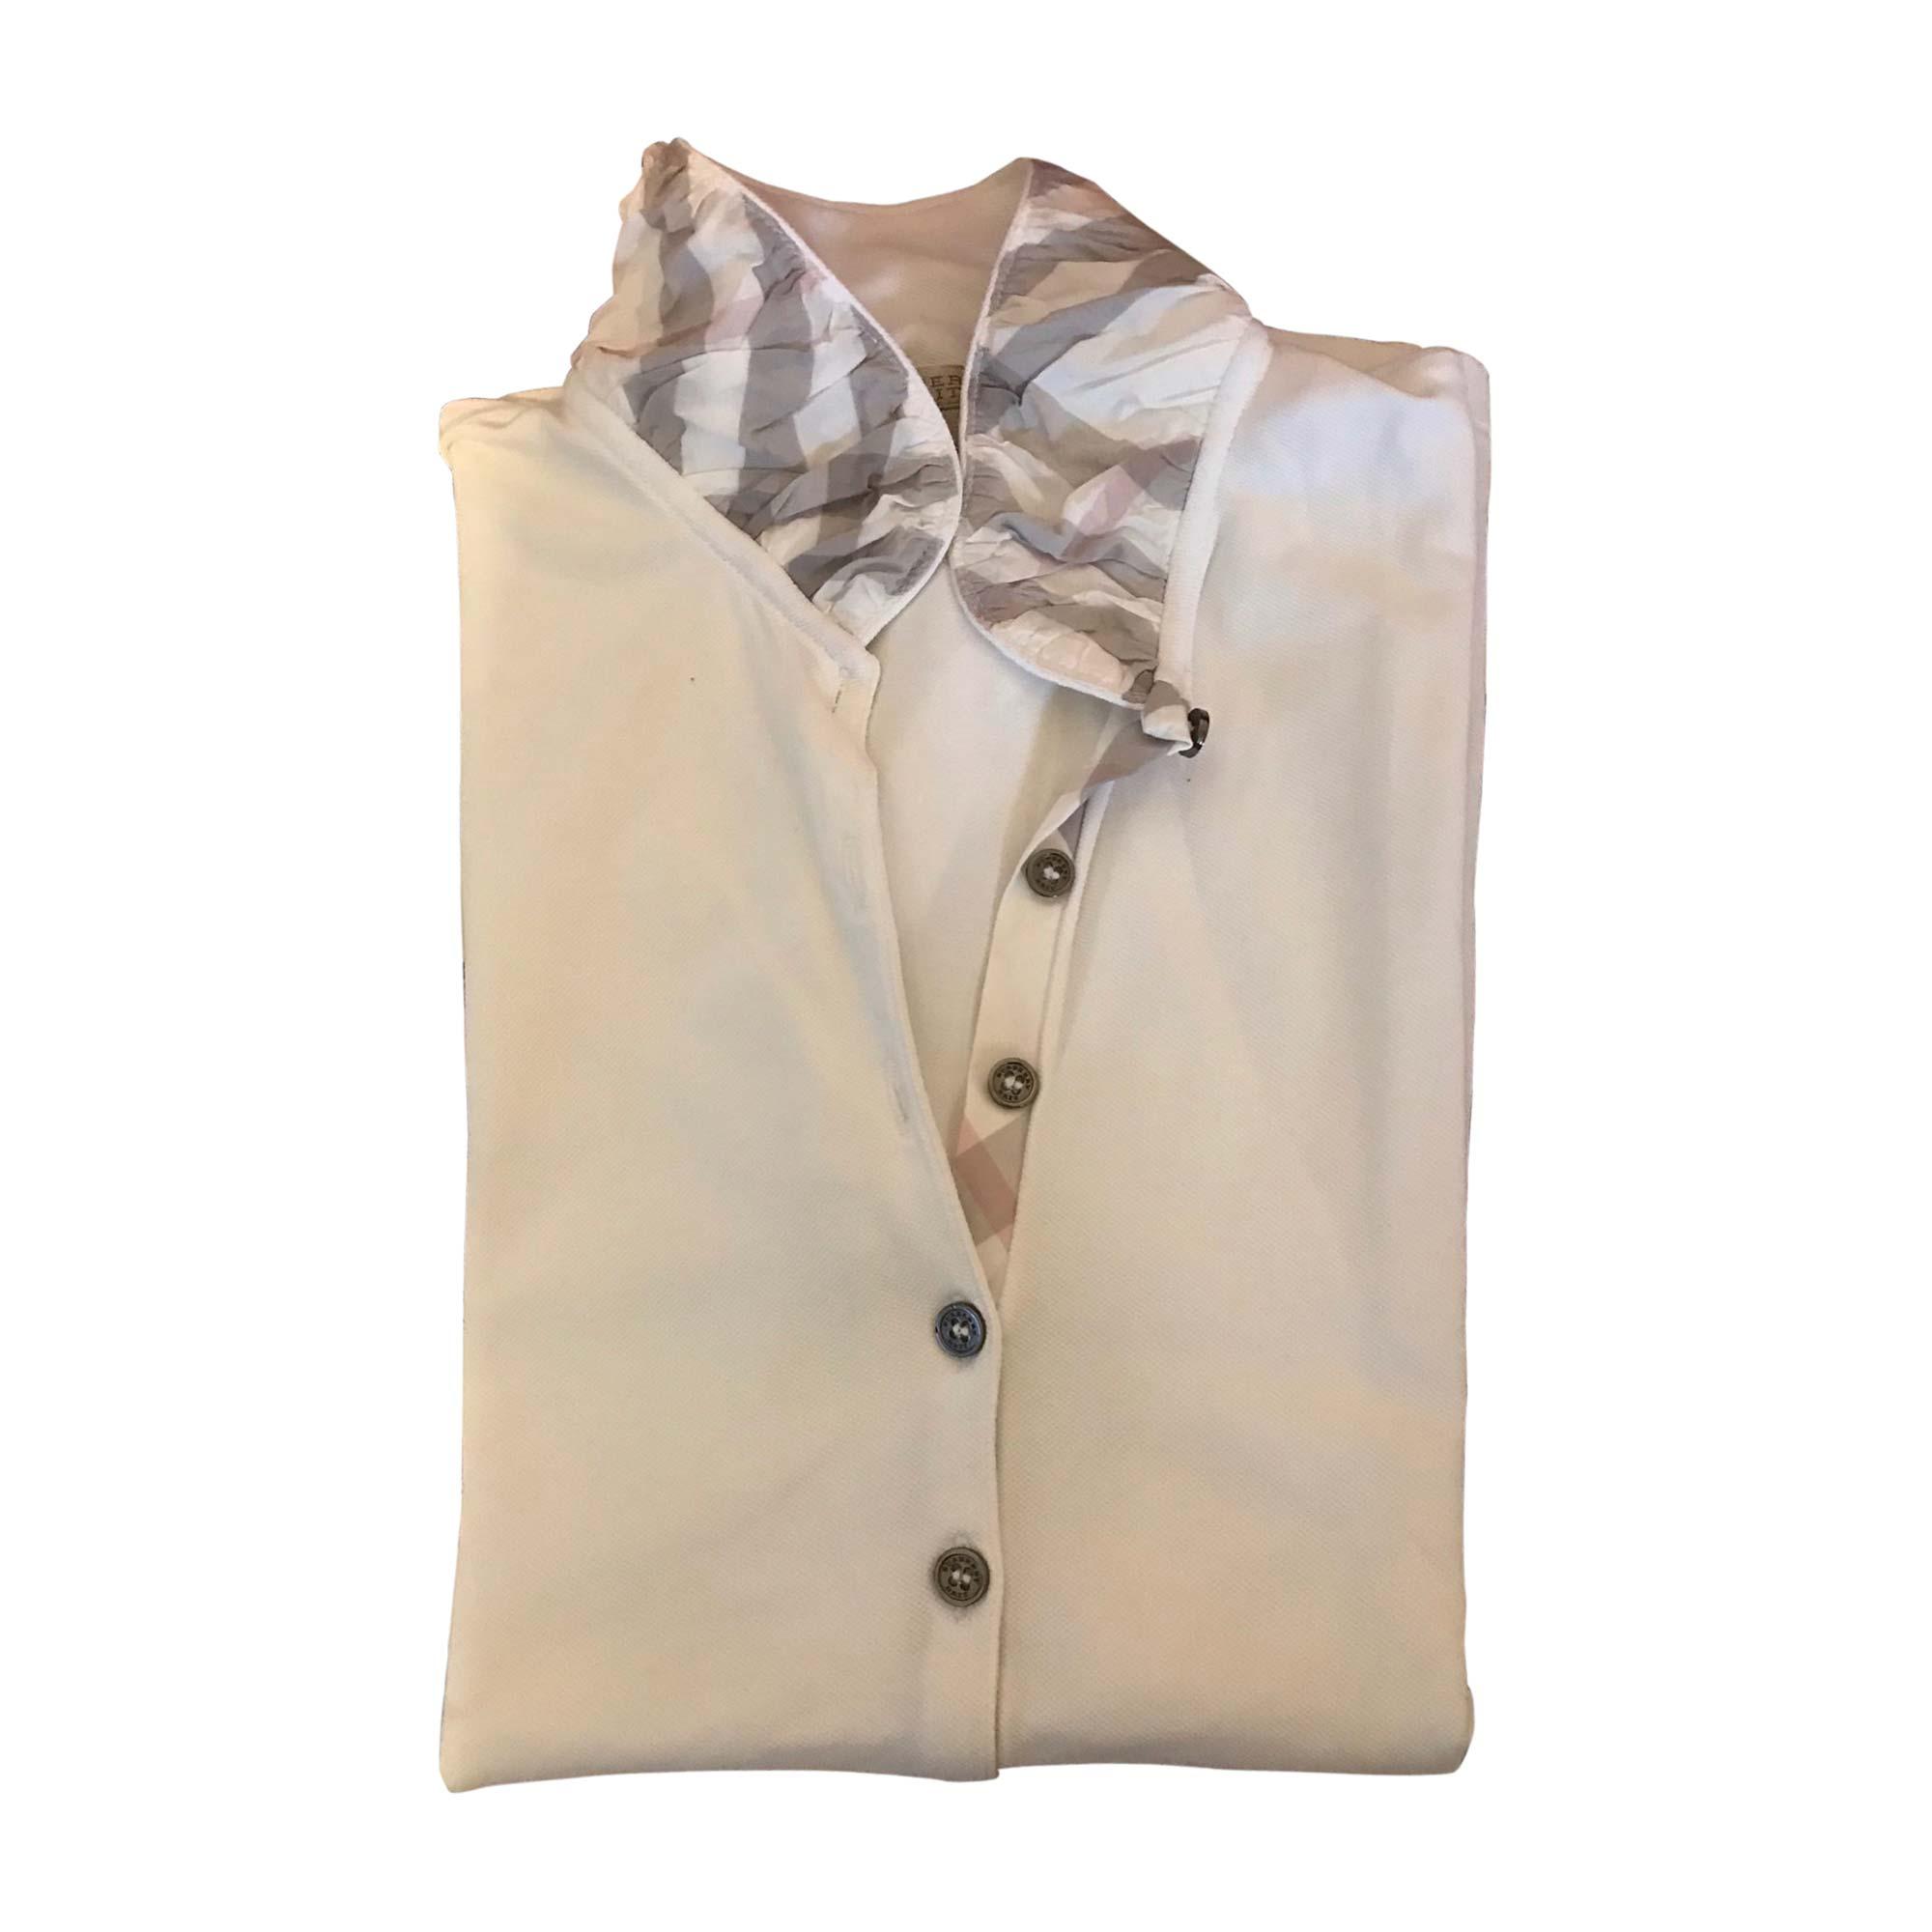 Polo BURBERRY White, off-white, ecru